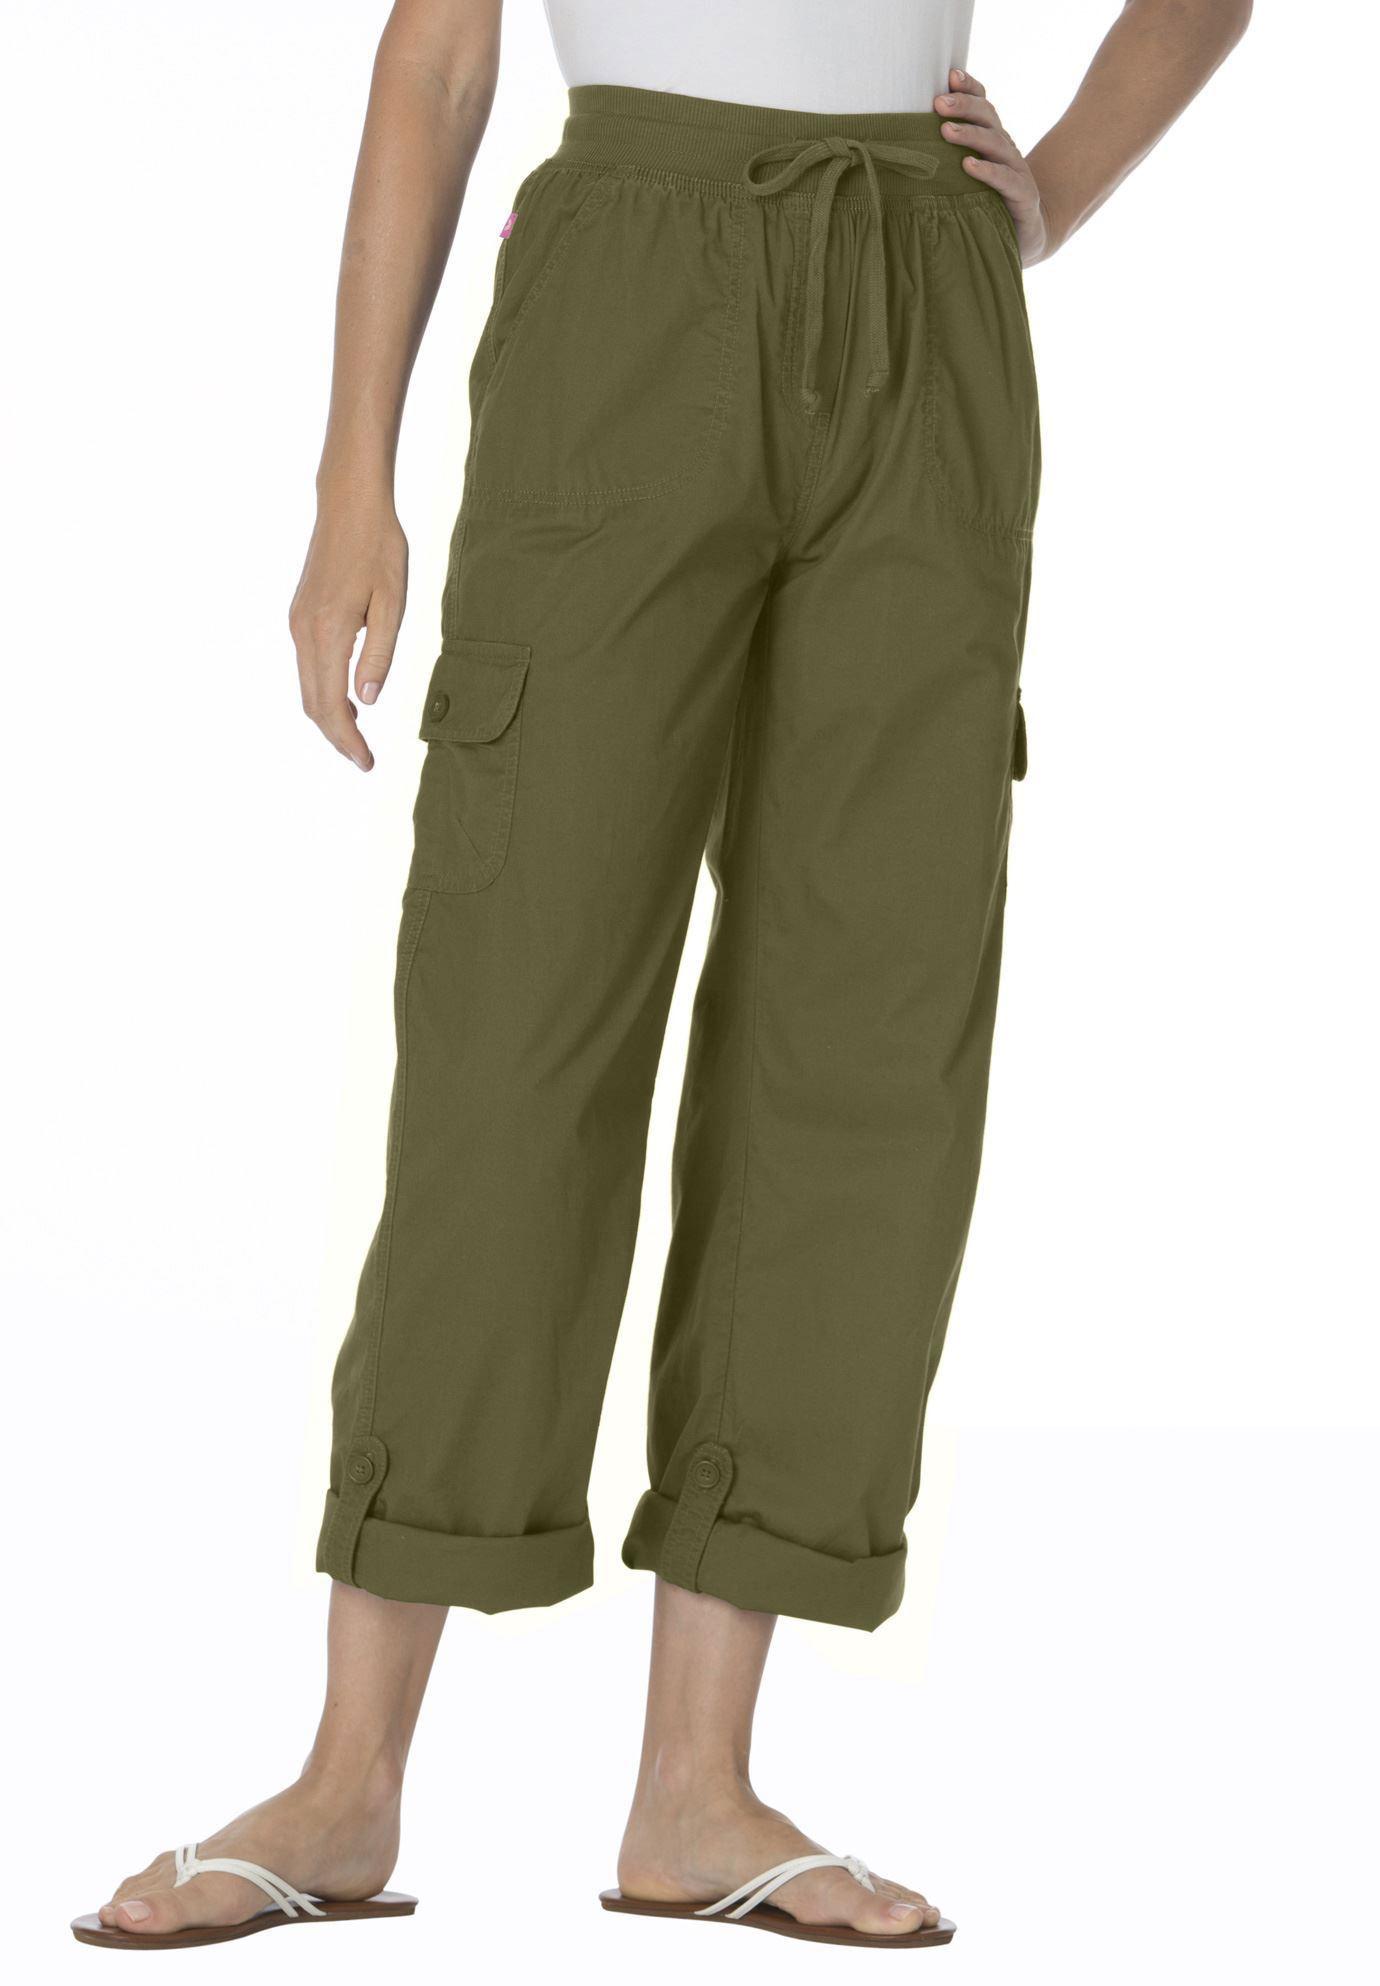 b81df6d1e61 Petite convertible cargo pants. Petite convertible cargo pants - Women s  Plus Size Clothing